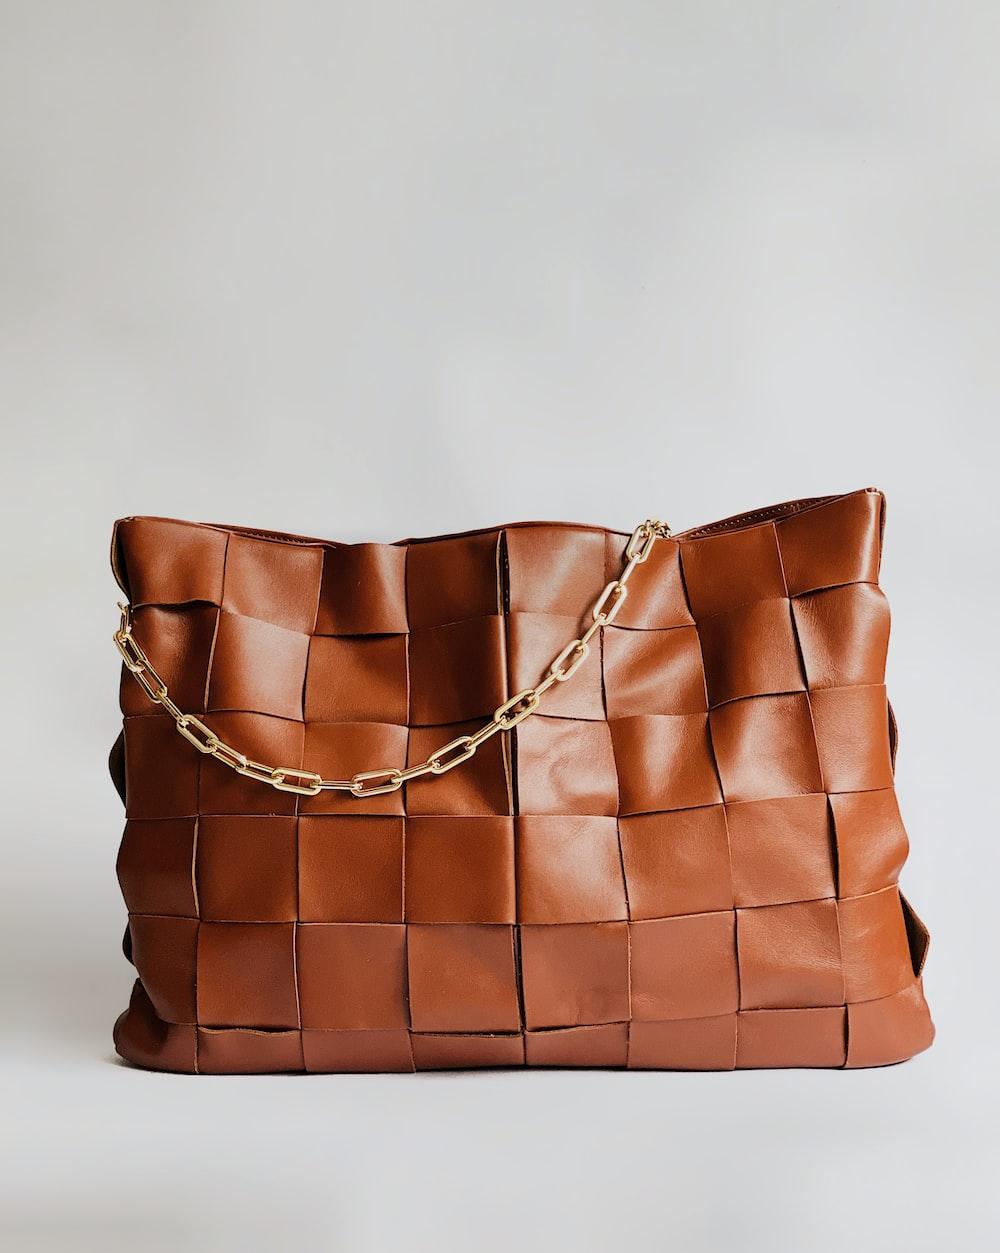 brown leather handbag on white surface